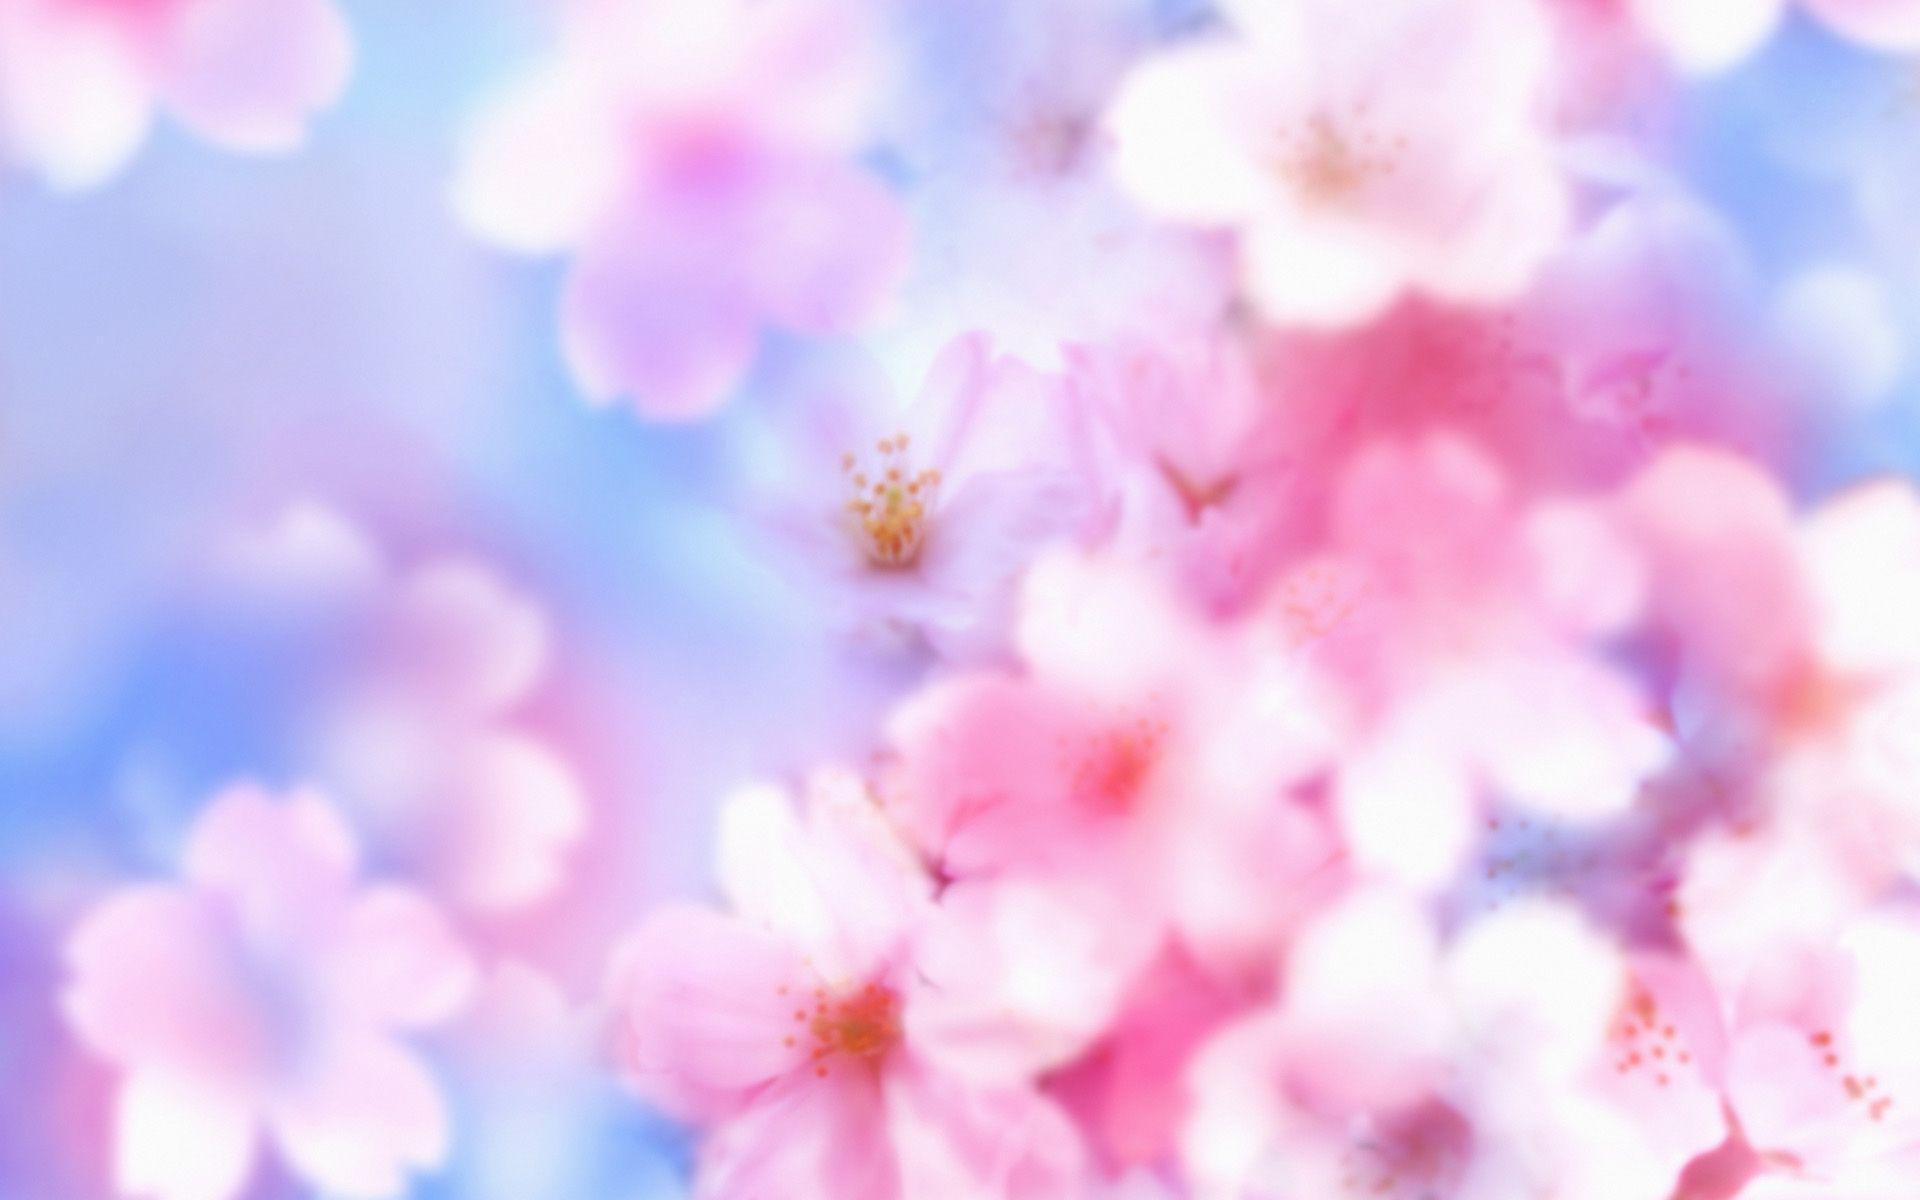 Desktop hd sakura flower background